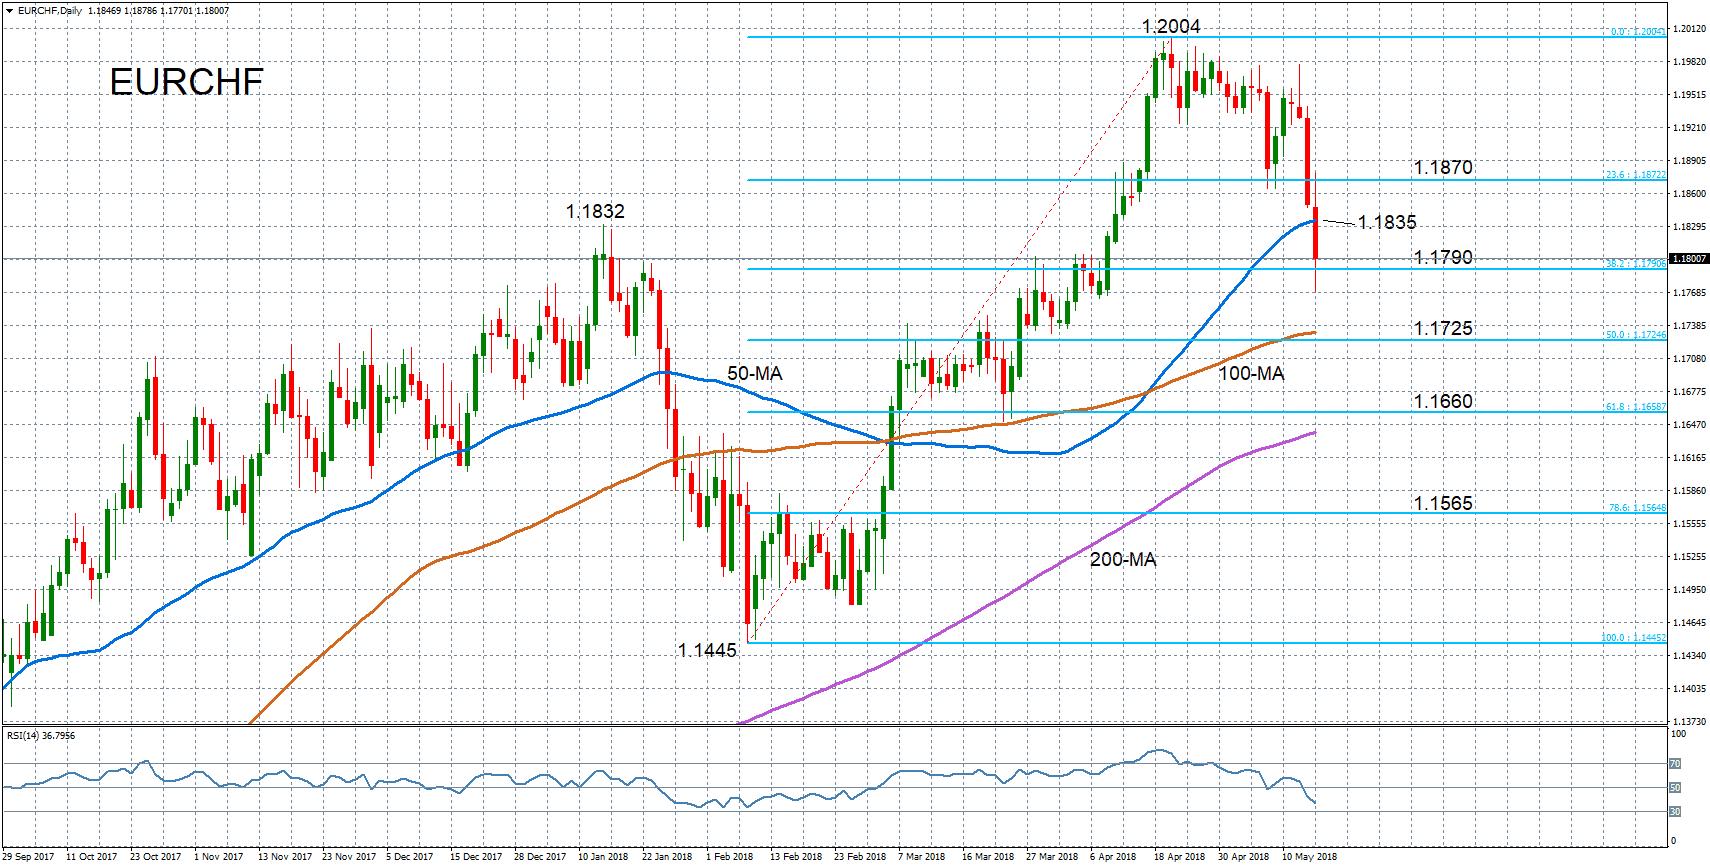 EUR/CHF euro franc suisse forex 16052018